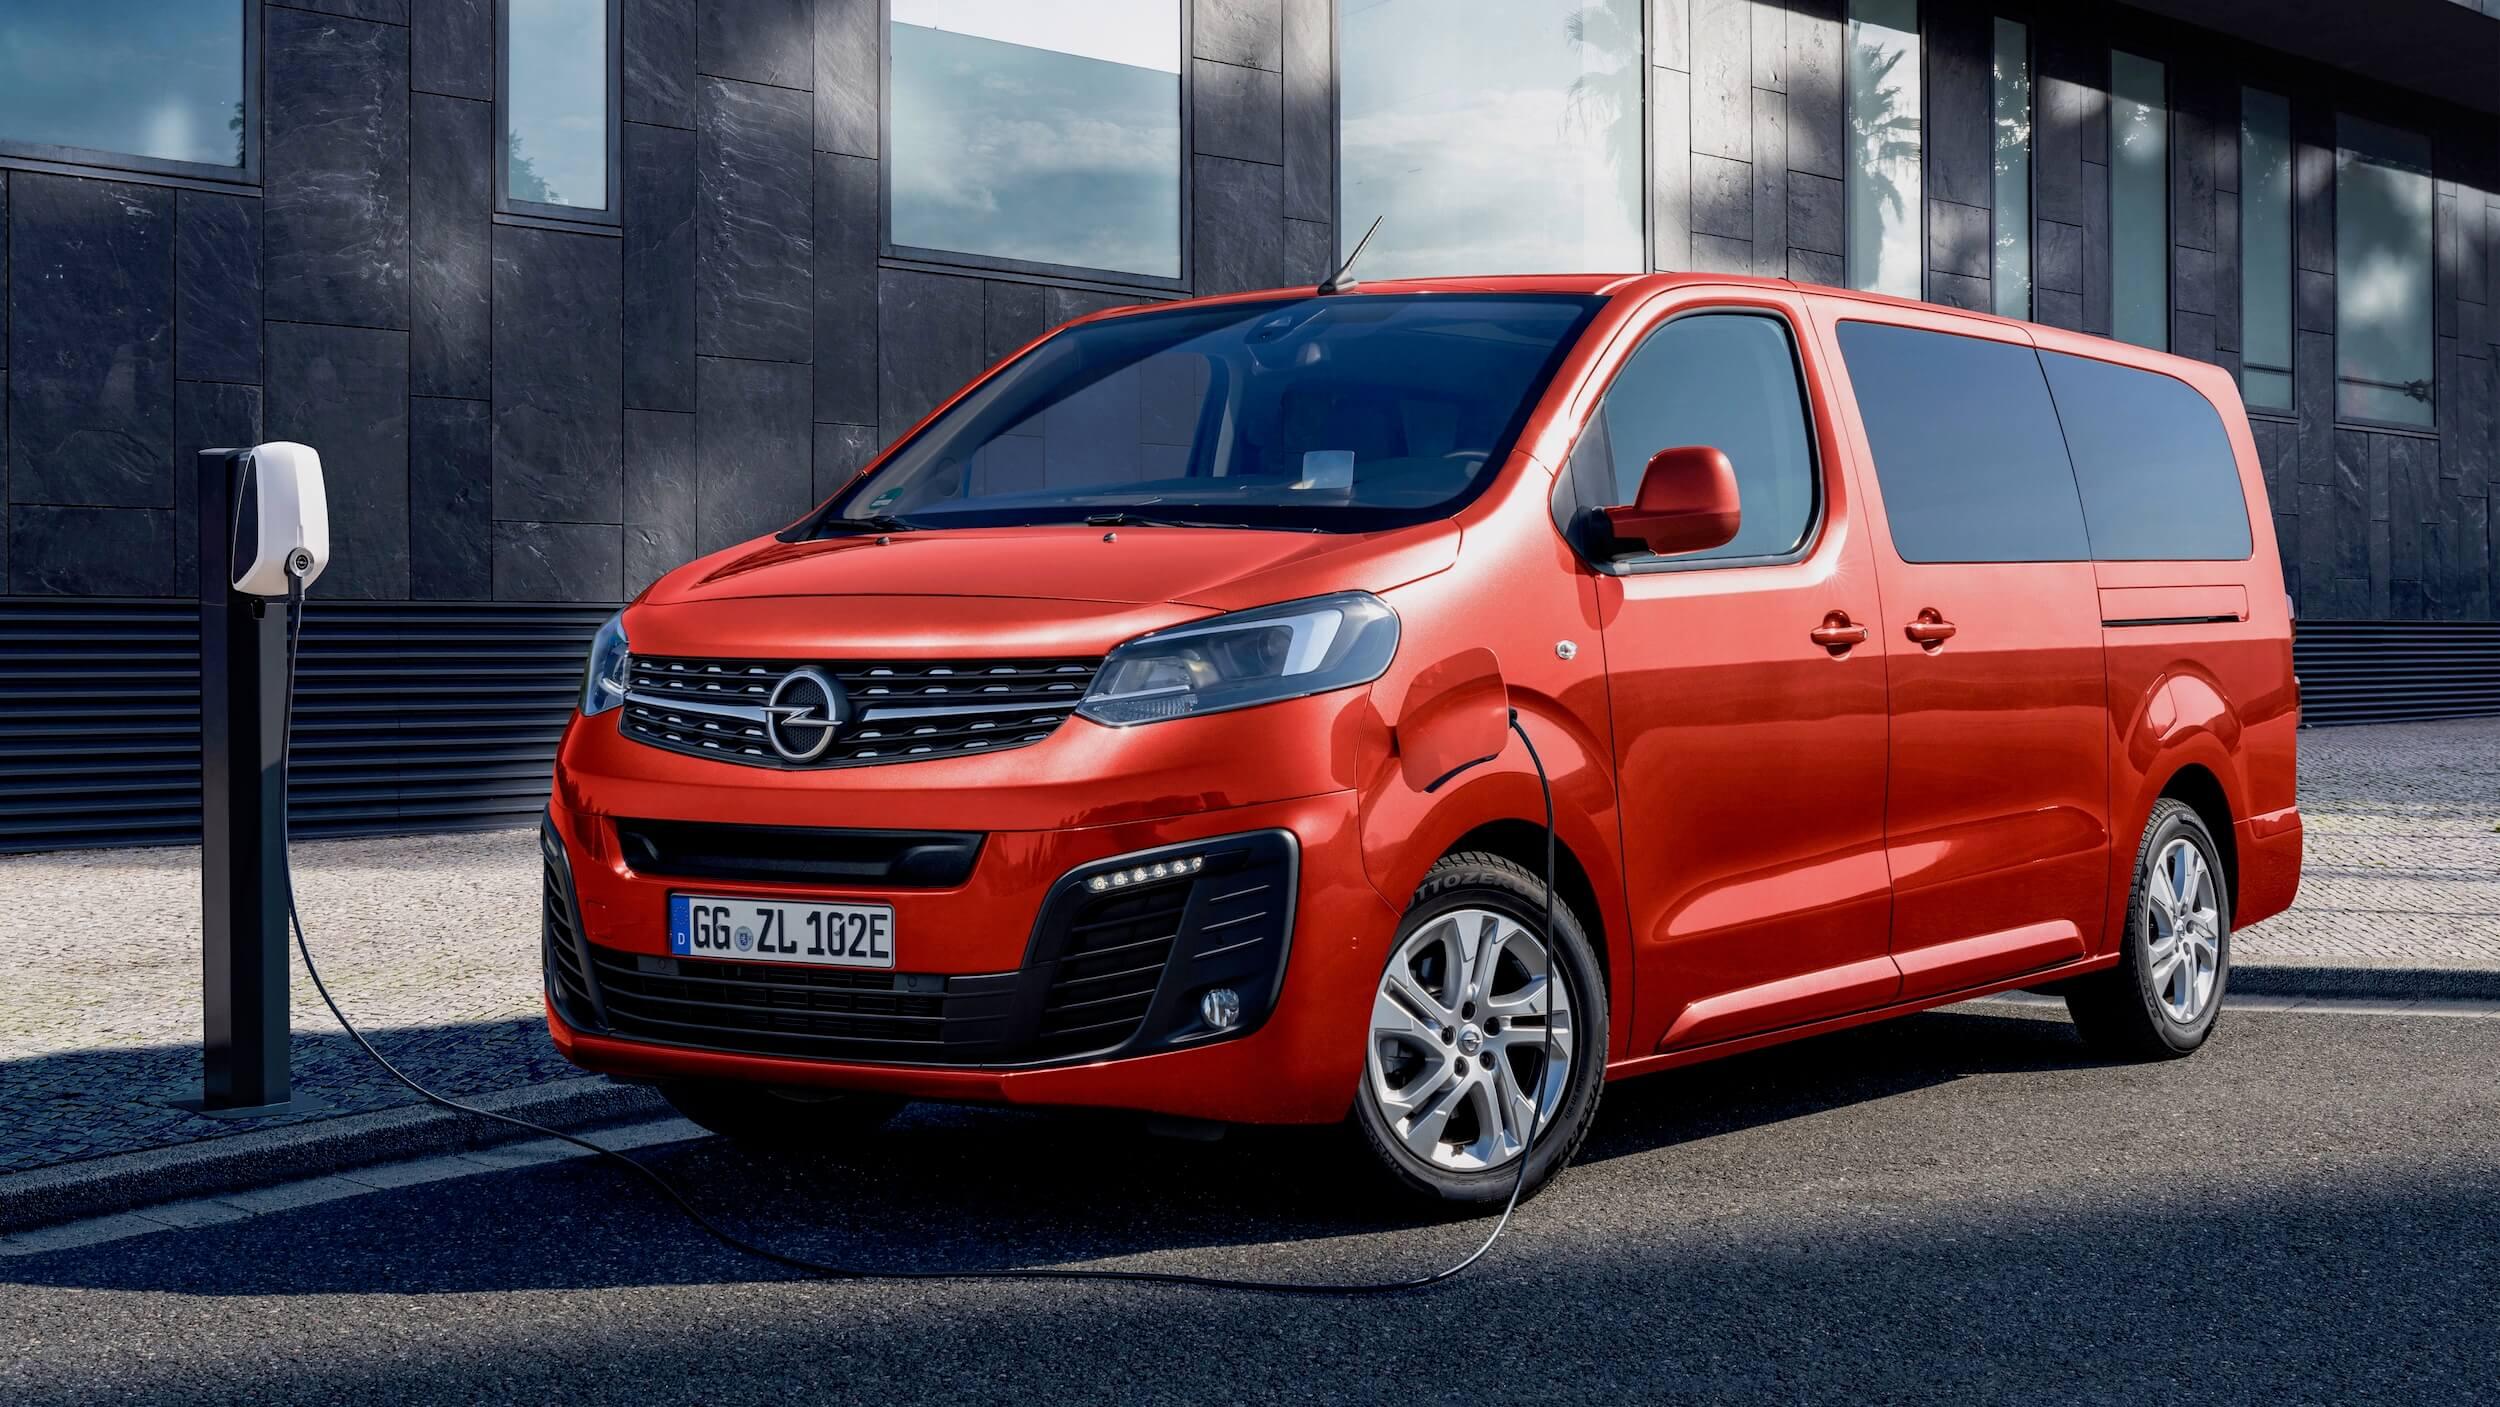 Elektrische Opel Zafira opladen aan laadpaal